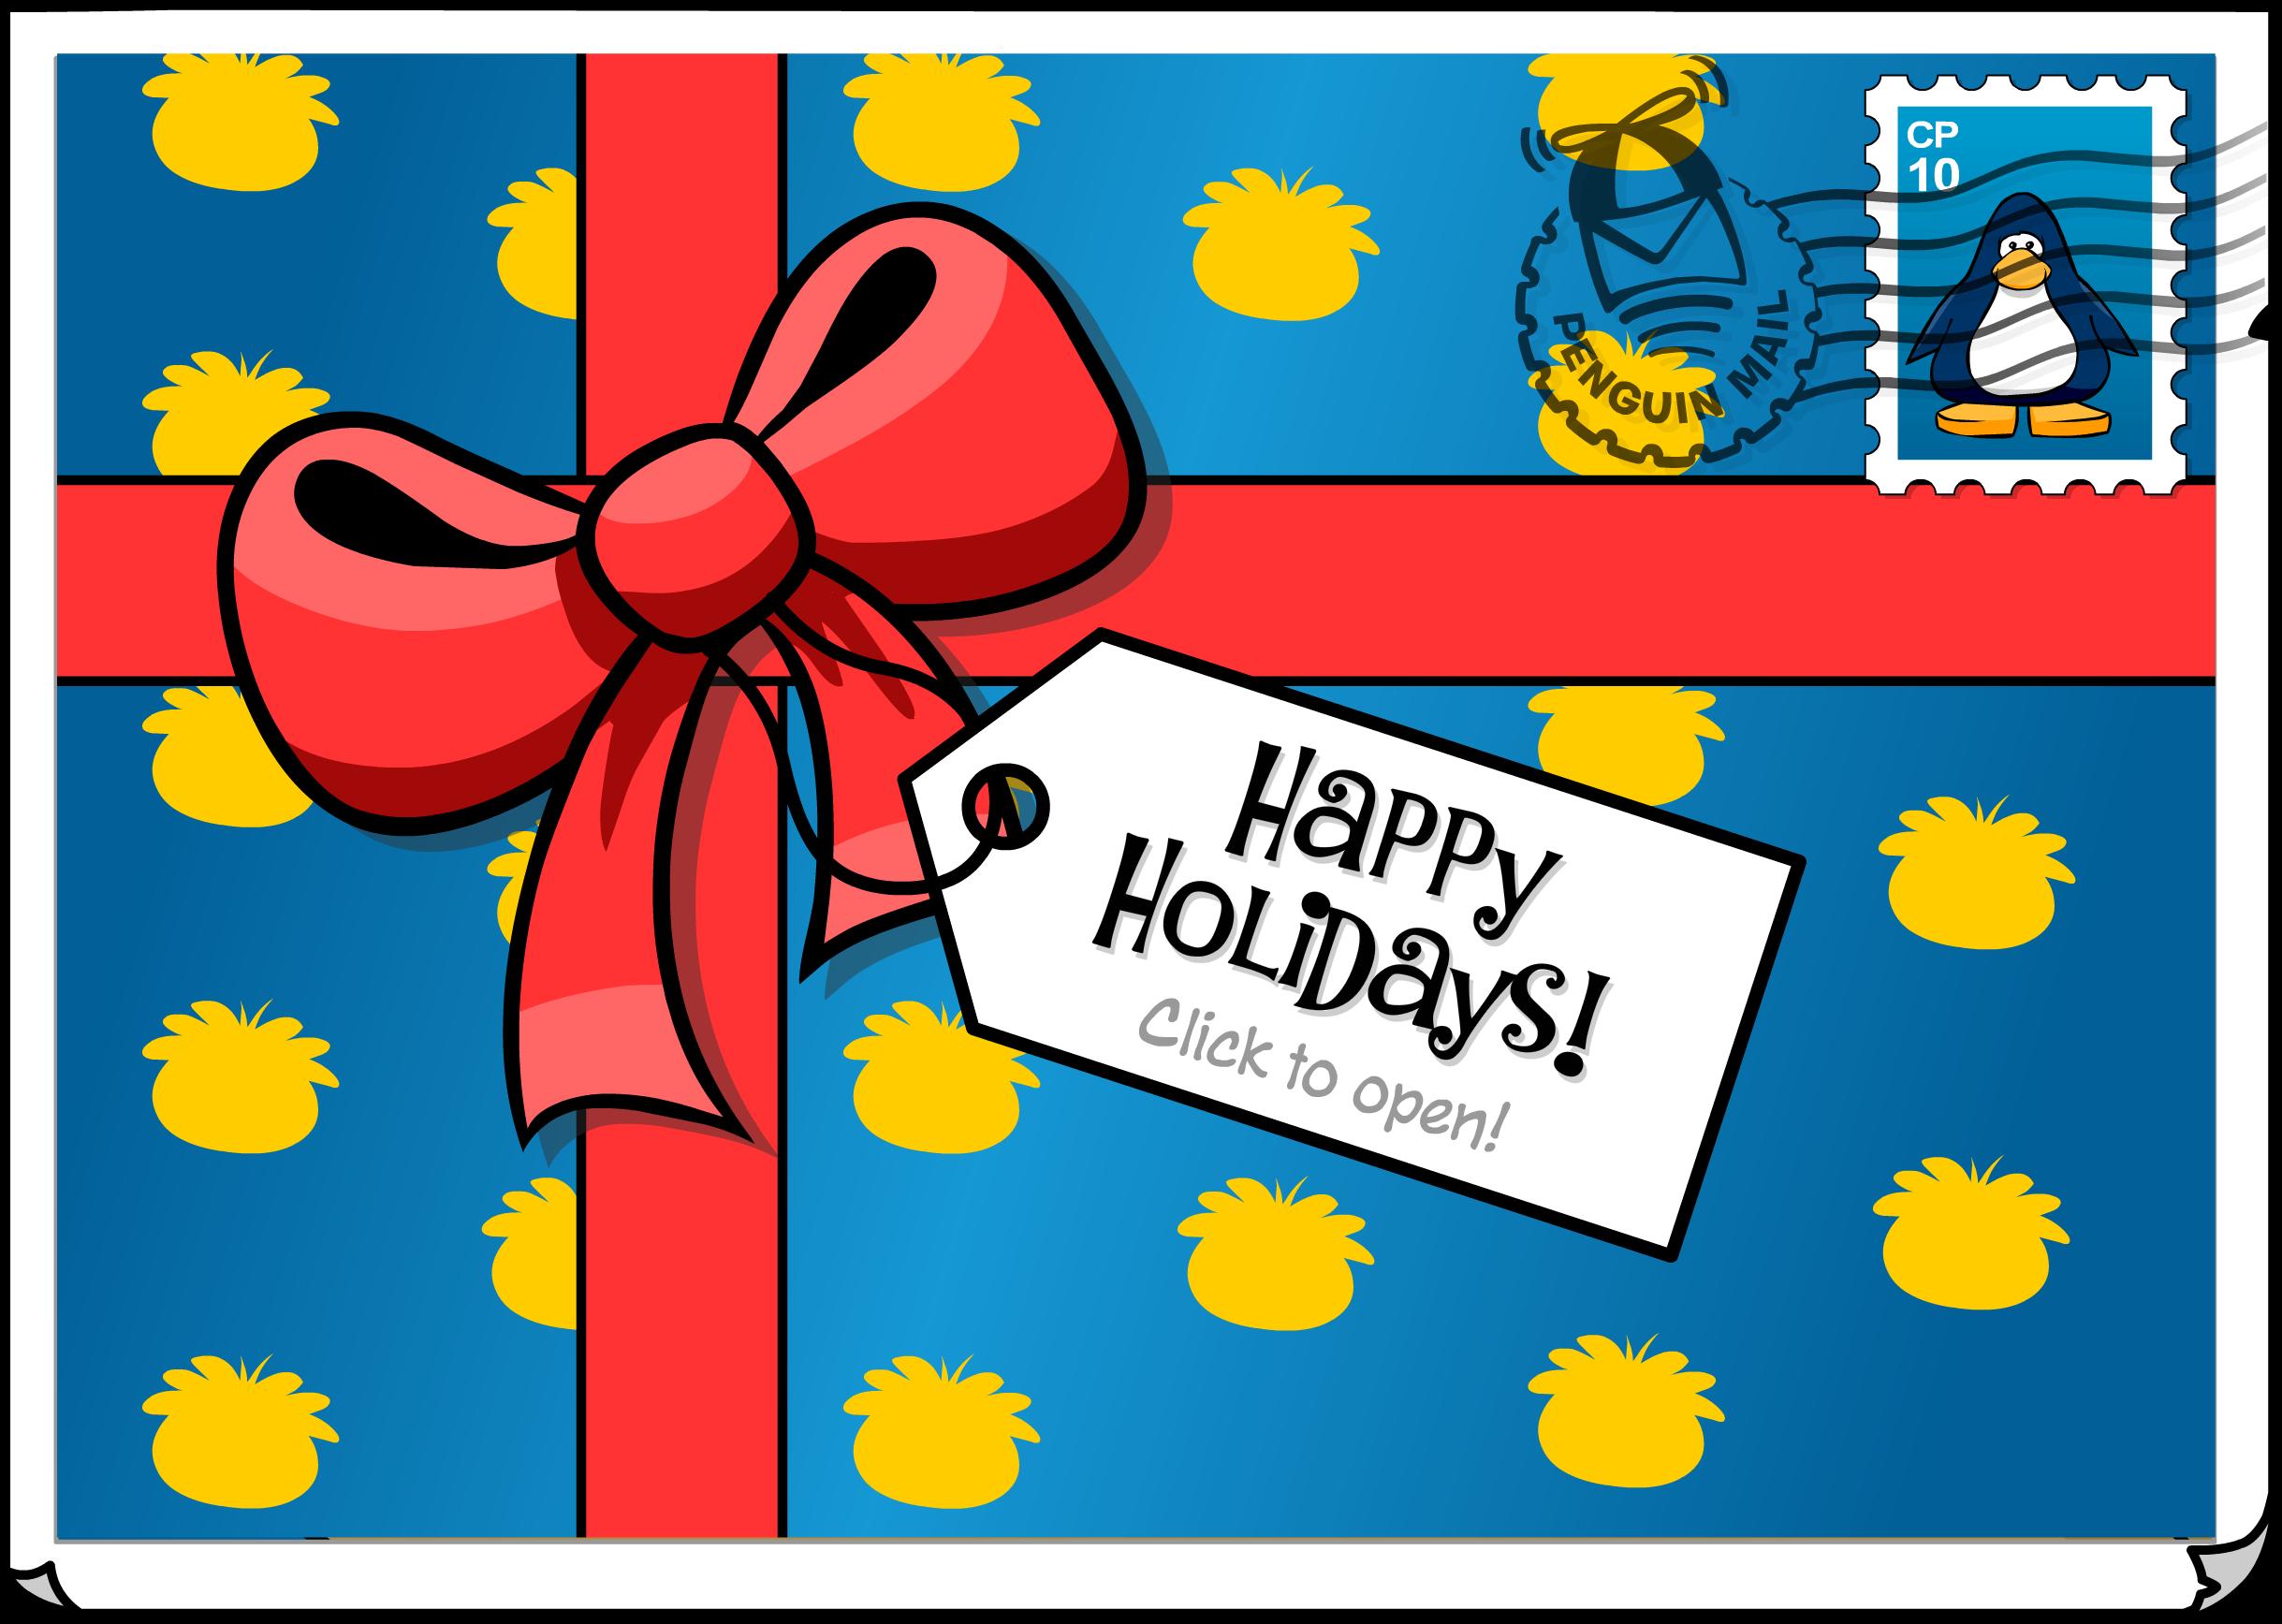 Happy Holidays Postcard (ID 216)